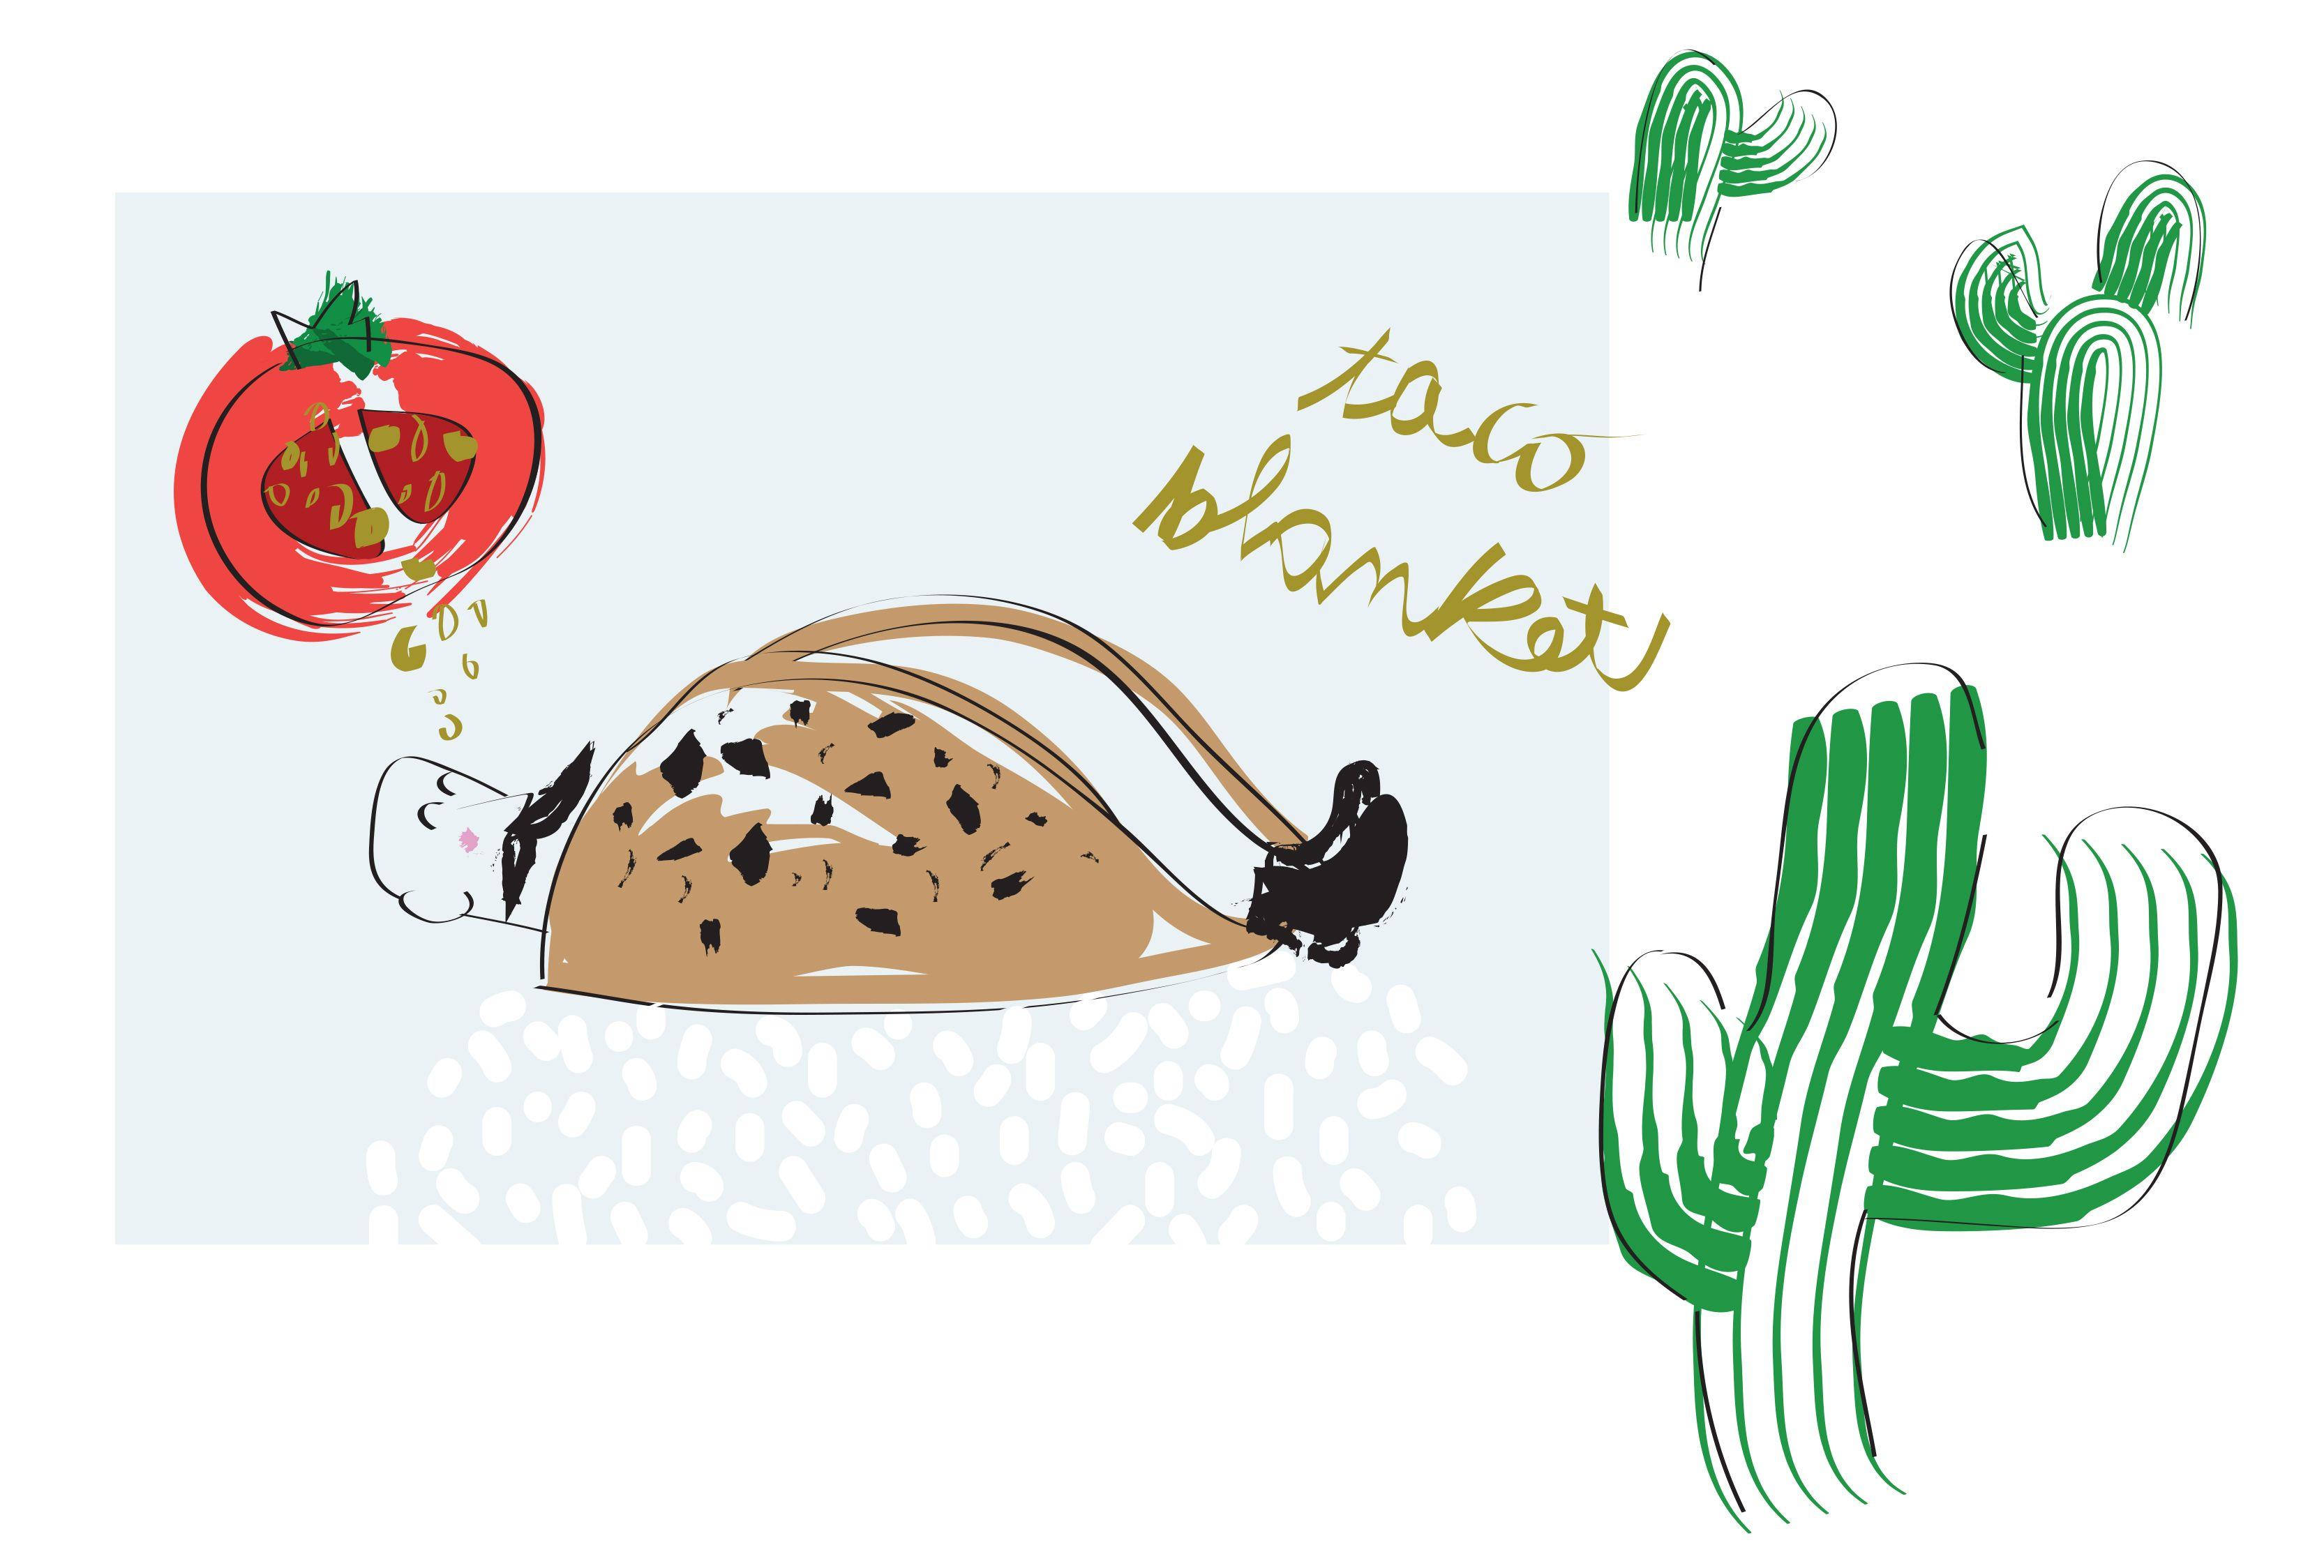 #illustration #MLC #taco #cactus #blanket